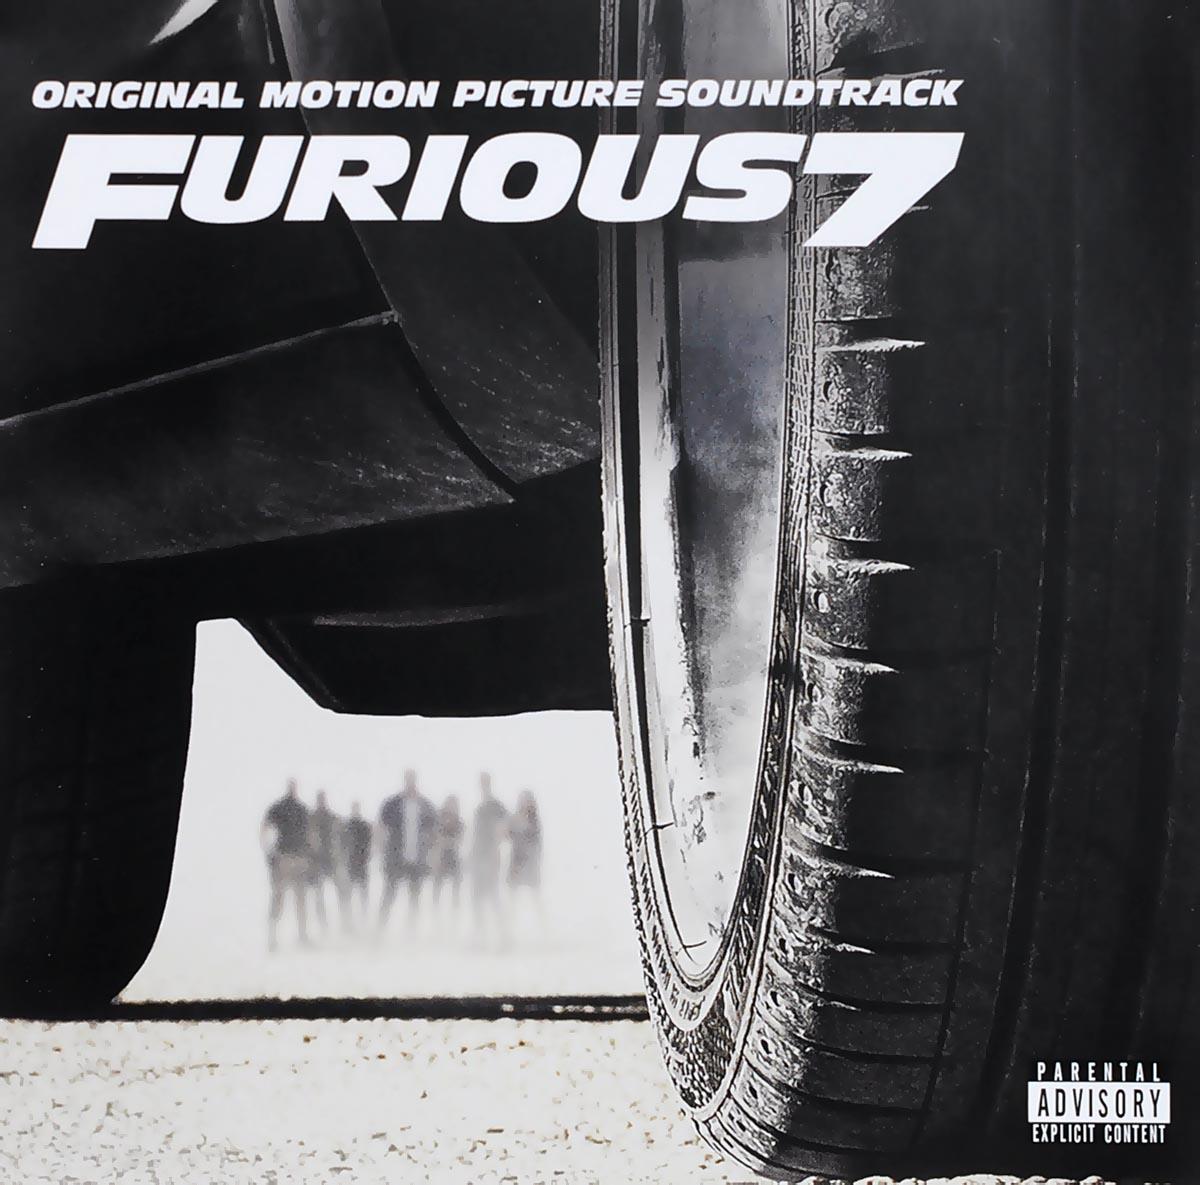 Furious 7. Original Motion Picture Soundtrack kama sutra original motion picture soundtrack